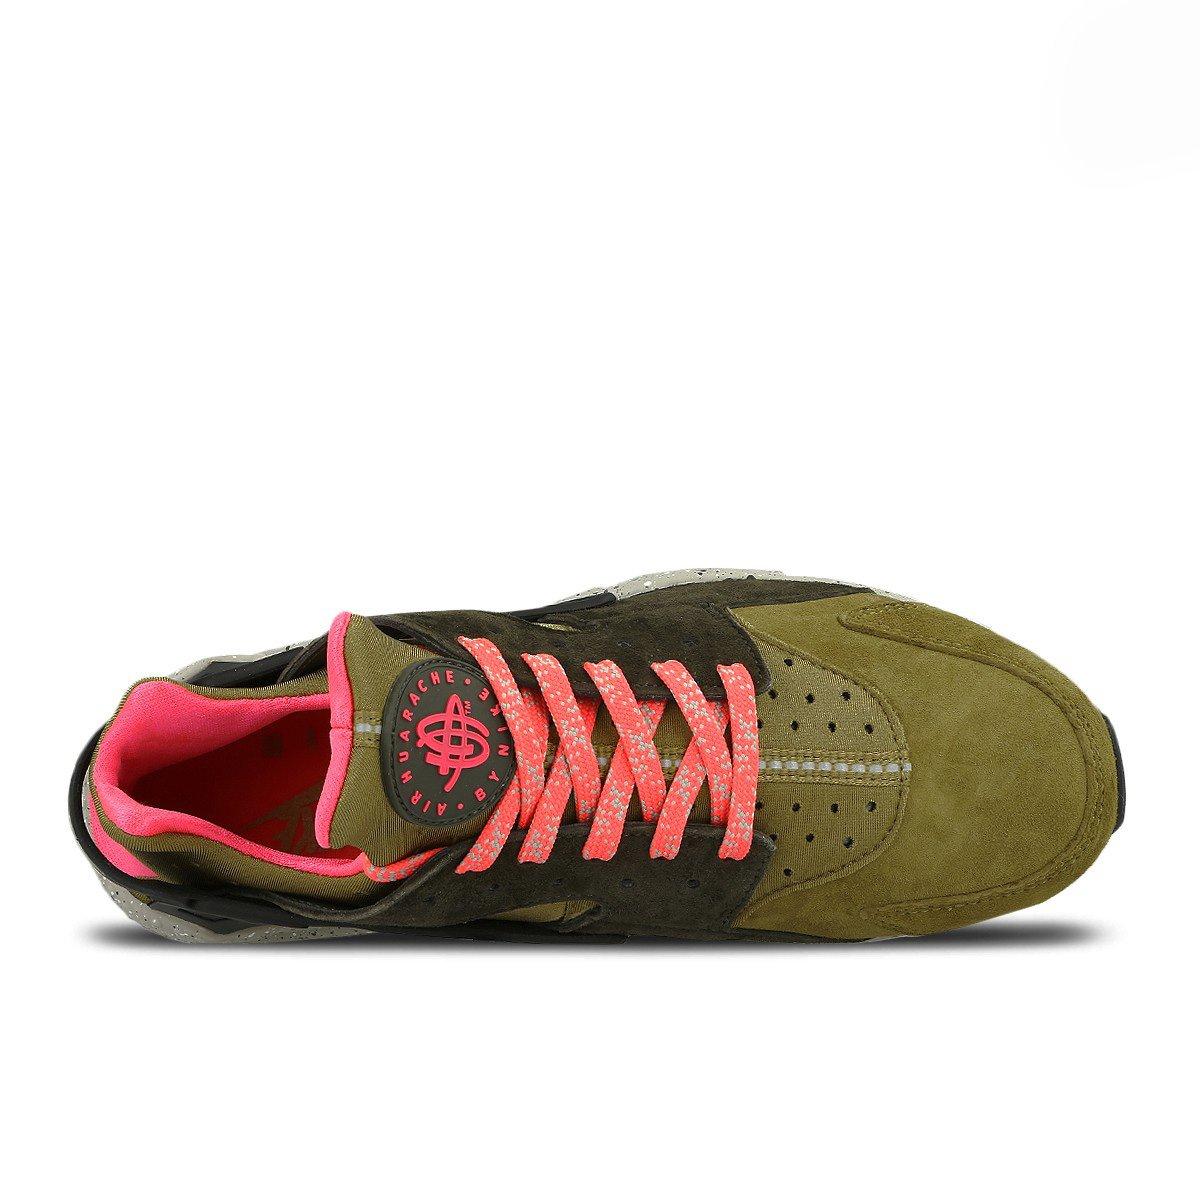 e38b6fecf2f0 Nike Air Huarache Run Premium 704830-302 Desert Moss   Cobblestone - Cargo  Khaki